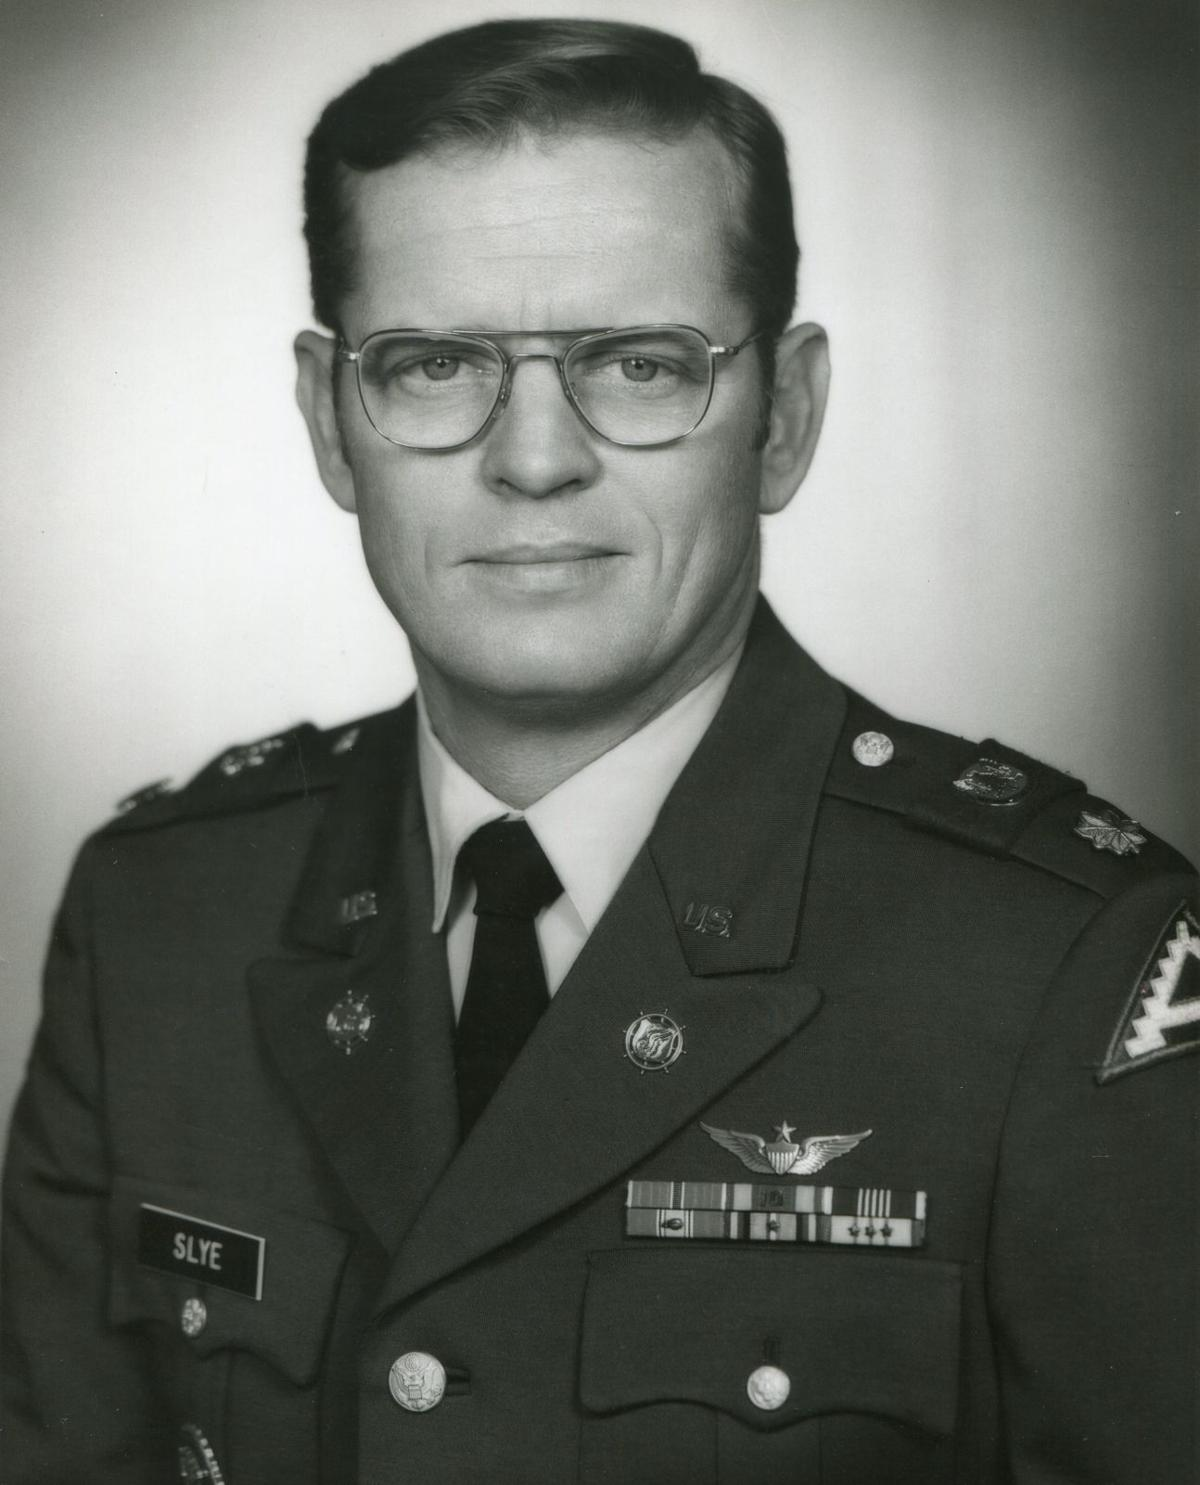 William Thomas Slye Jr.